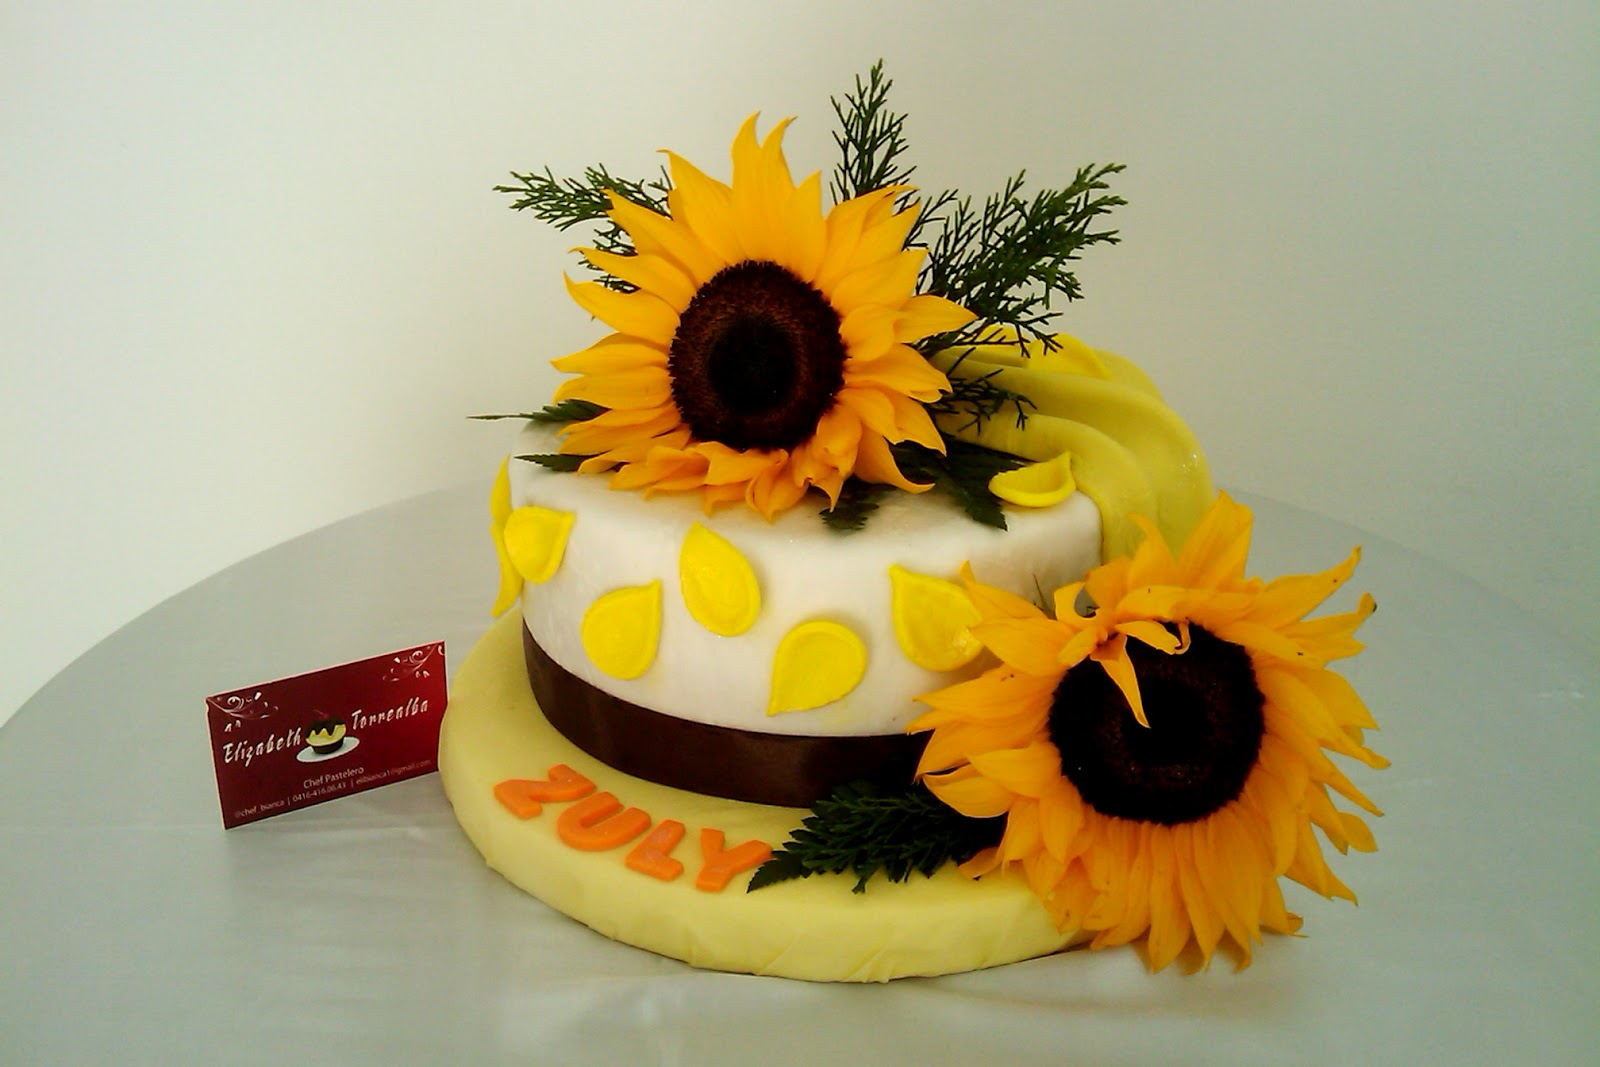 Pastel Arreglo Floral Girasoles Pasteleria Bianc